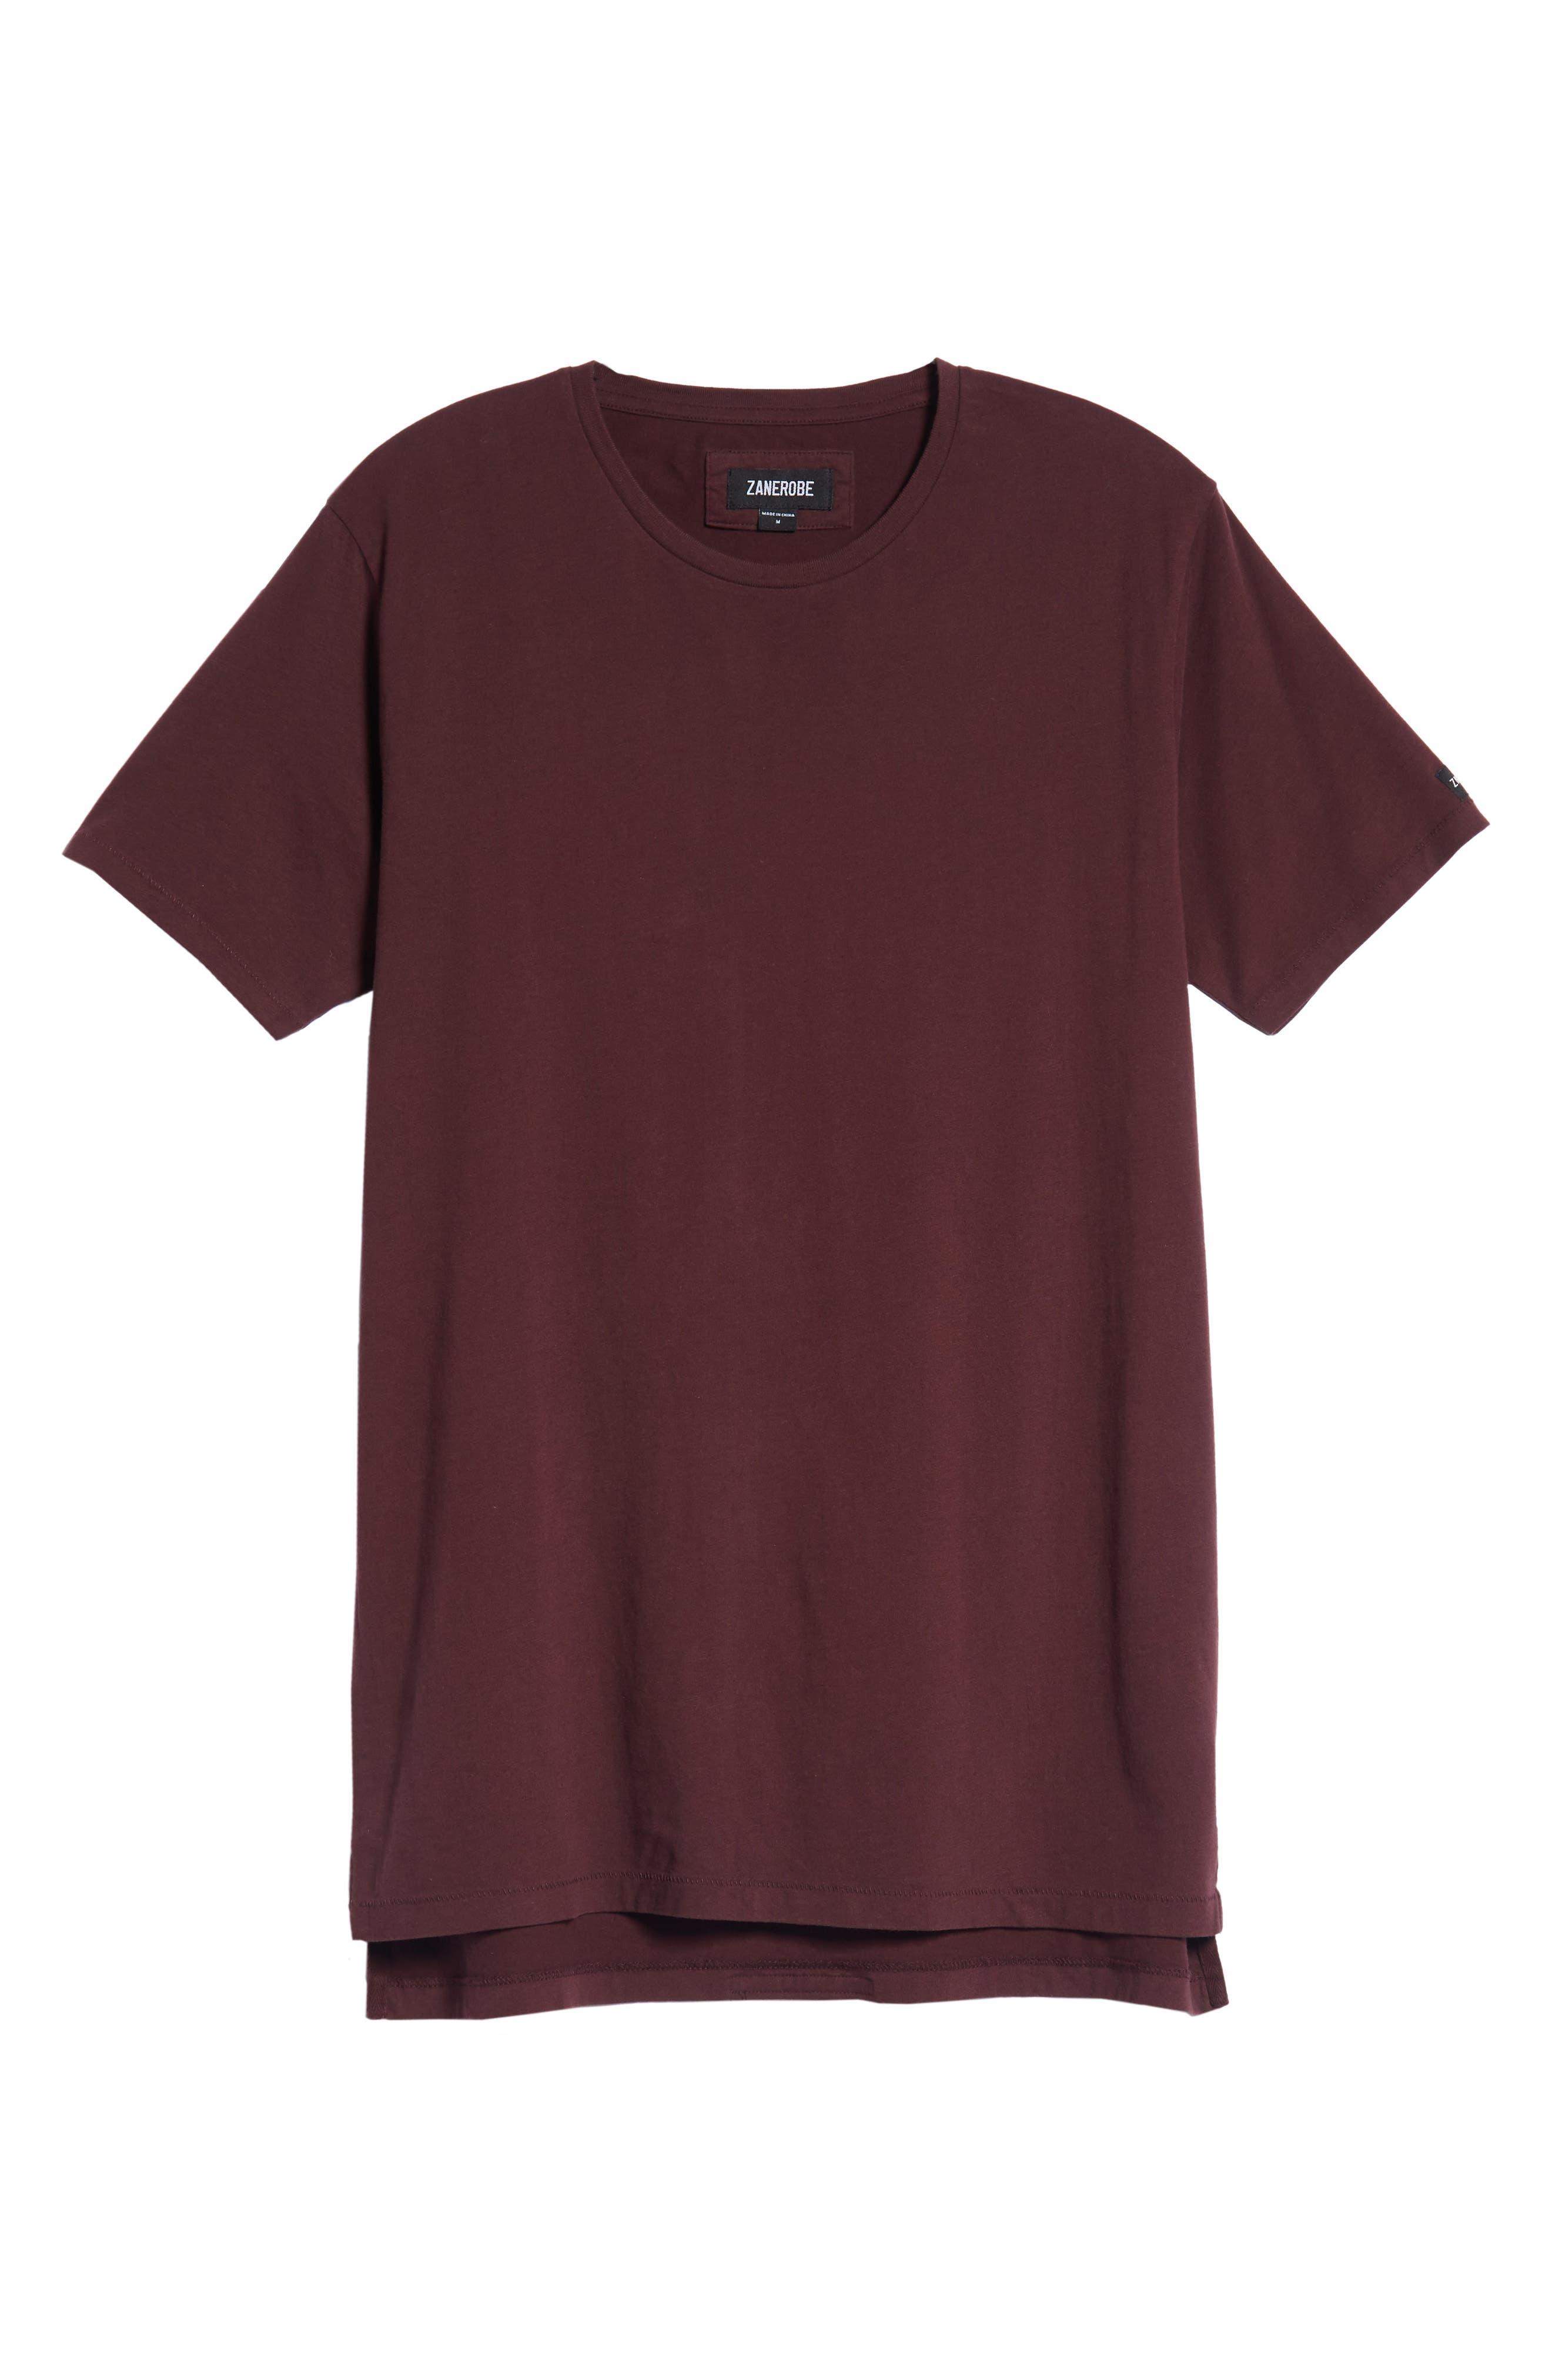 Flintlock T-Shirt,                             Alternate thumbnail 6, color,                             PORT